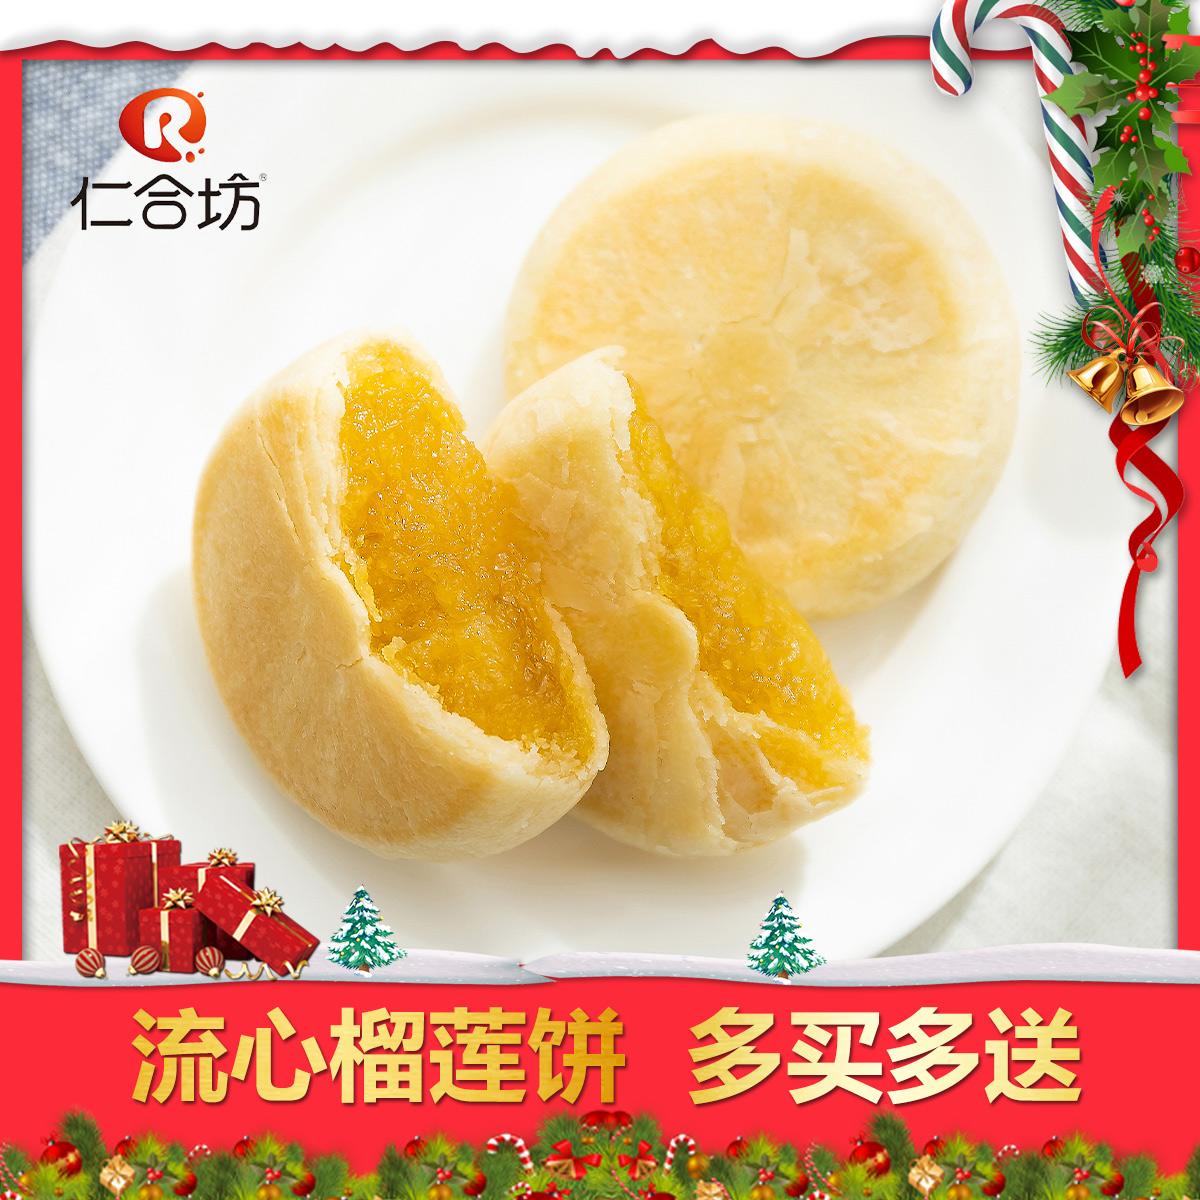 Renhefang maoshanwang durian cake snack food leisure snack pastry durian cake whole box Snack